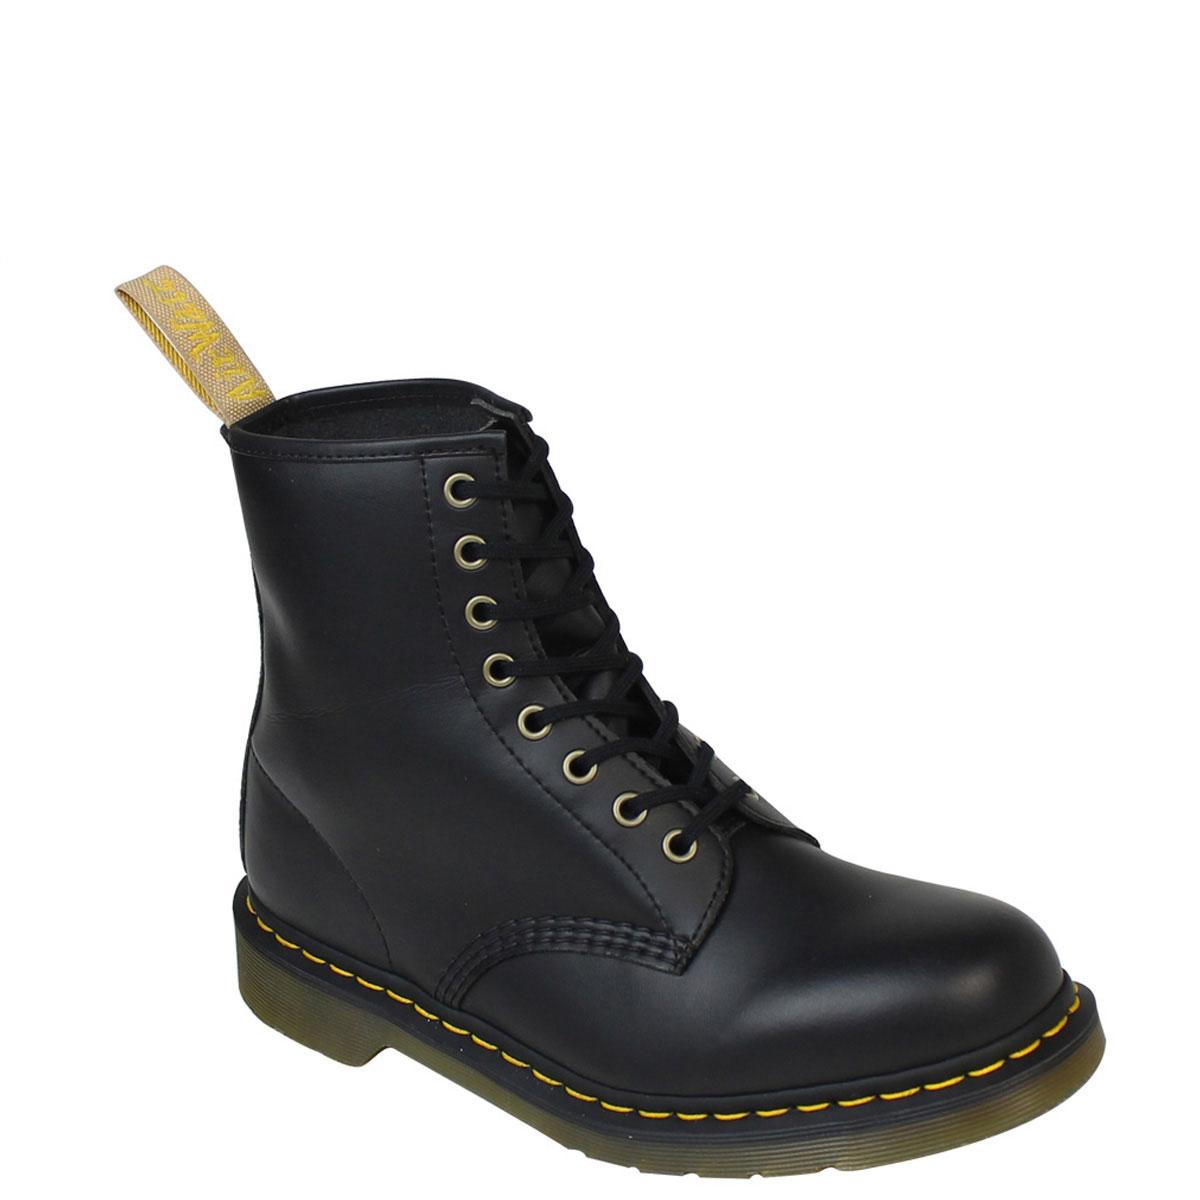 9ec26800e761 Categories. « All Categories · Shoes · Men's Shoes · Boots · Work · Dr. Martens  Dr.Martens 1460 8 hole boots VEGAN synthetic leather mens ...